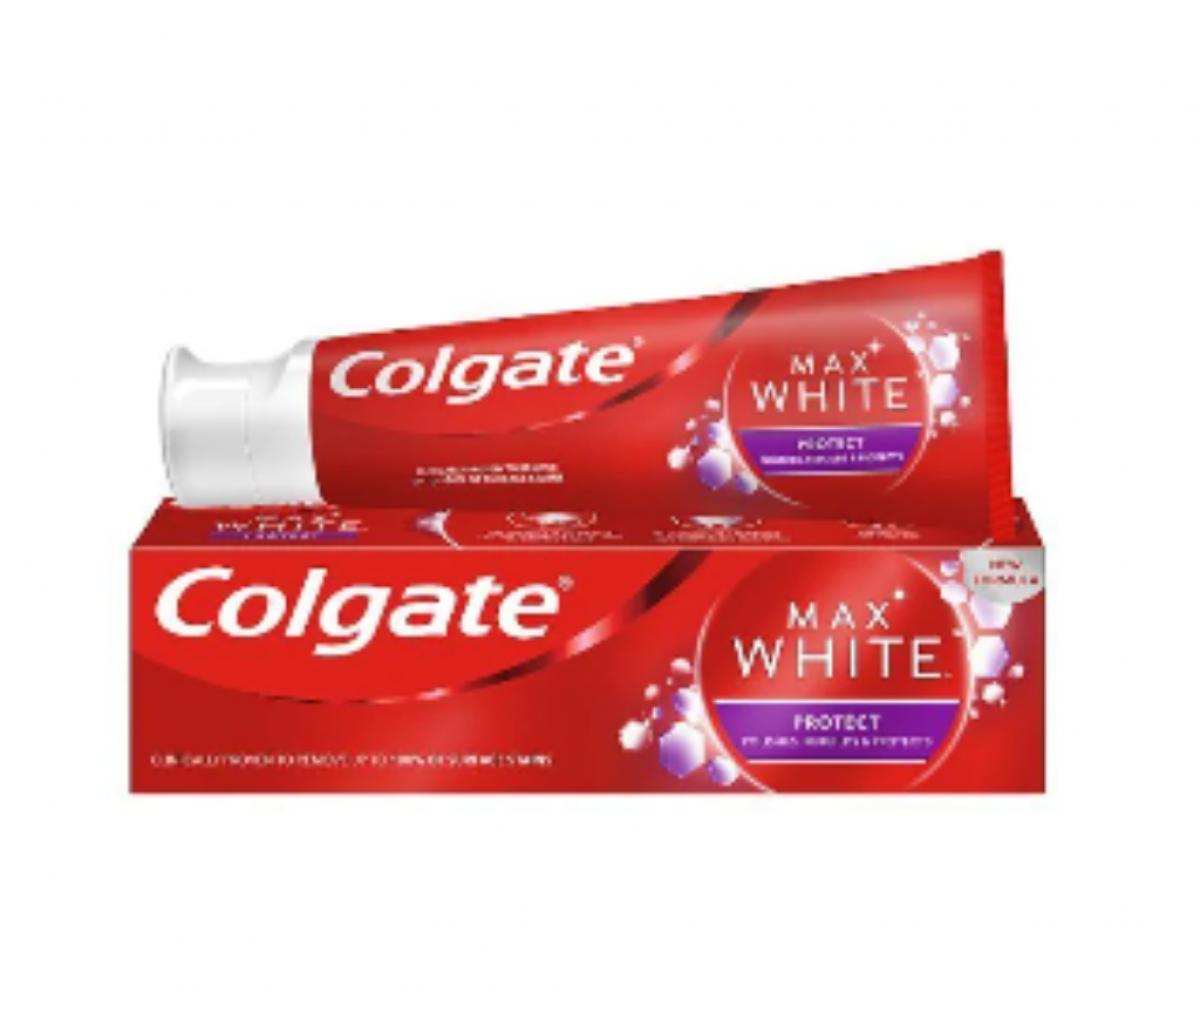 Colgate 75ml Whitening